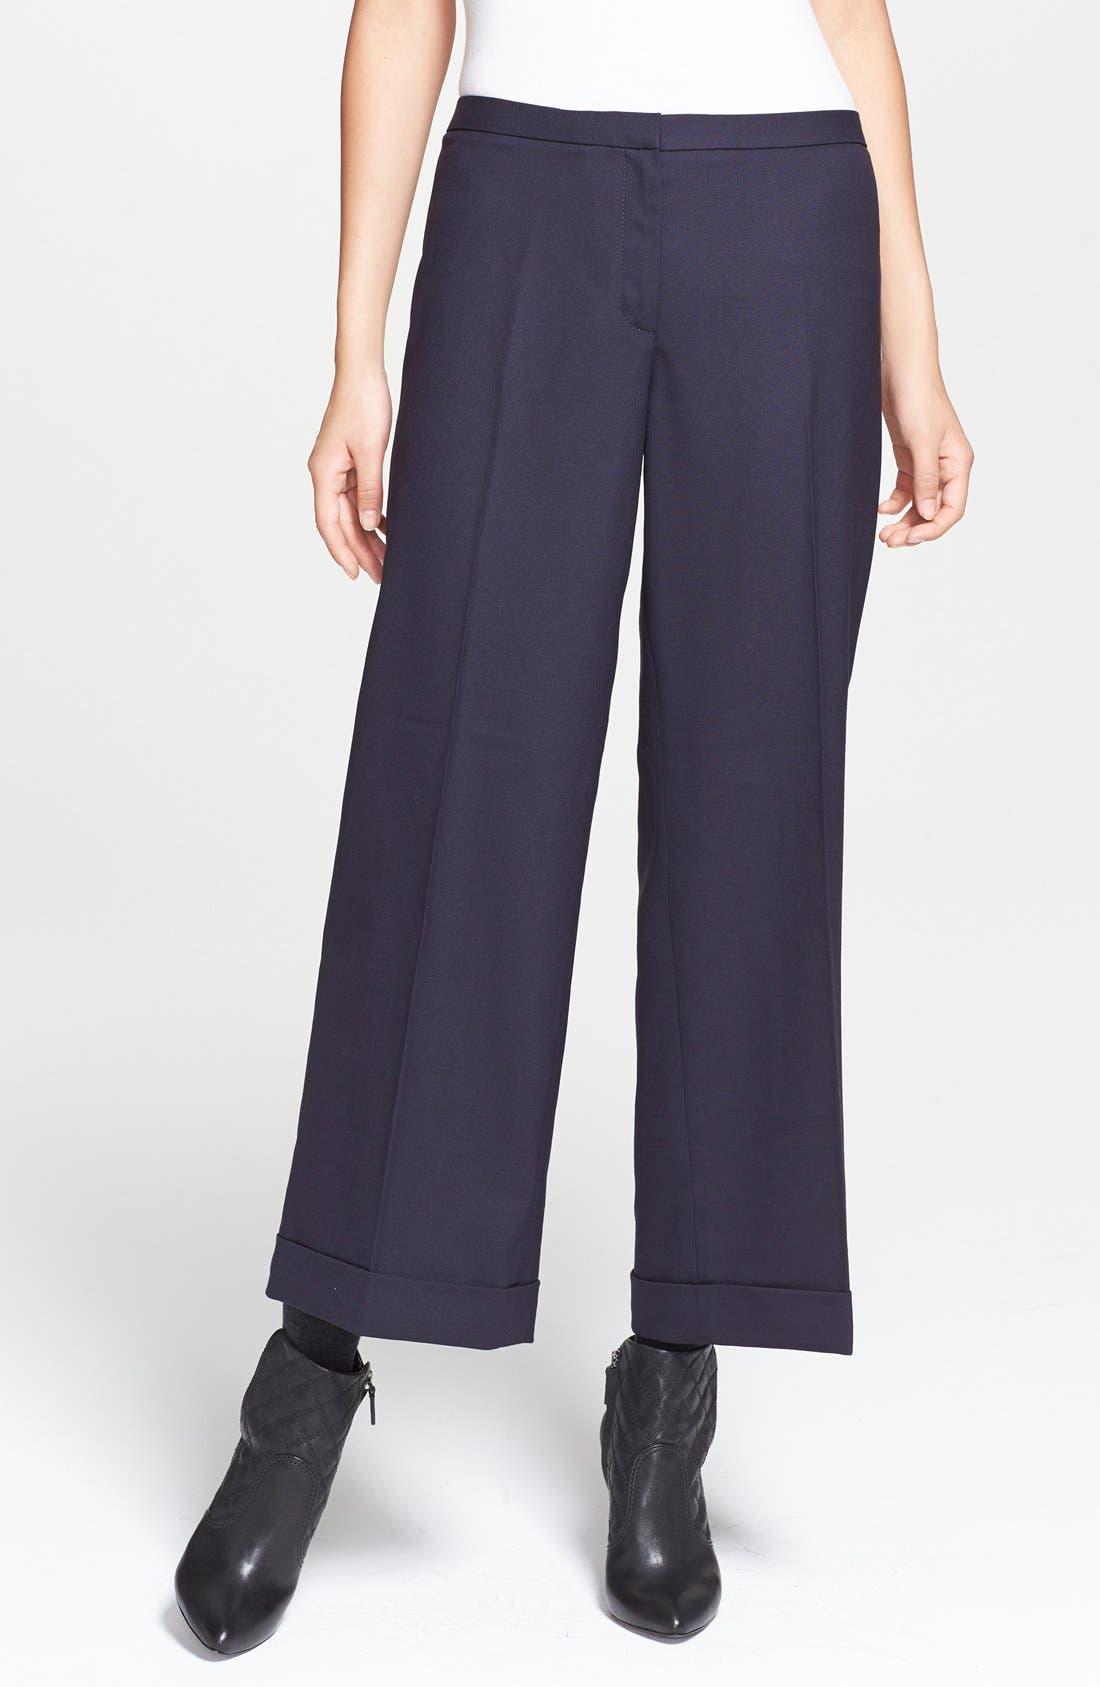 Alternate Image 1 Selected - Tory Burch 'Fern' Stretch Wool Wide Leg Crop Pants